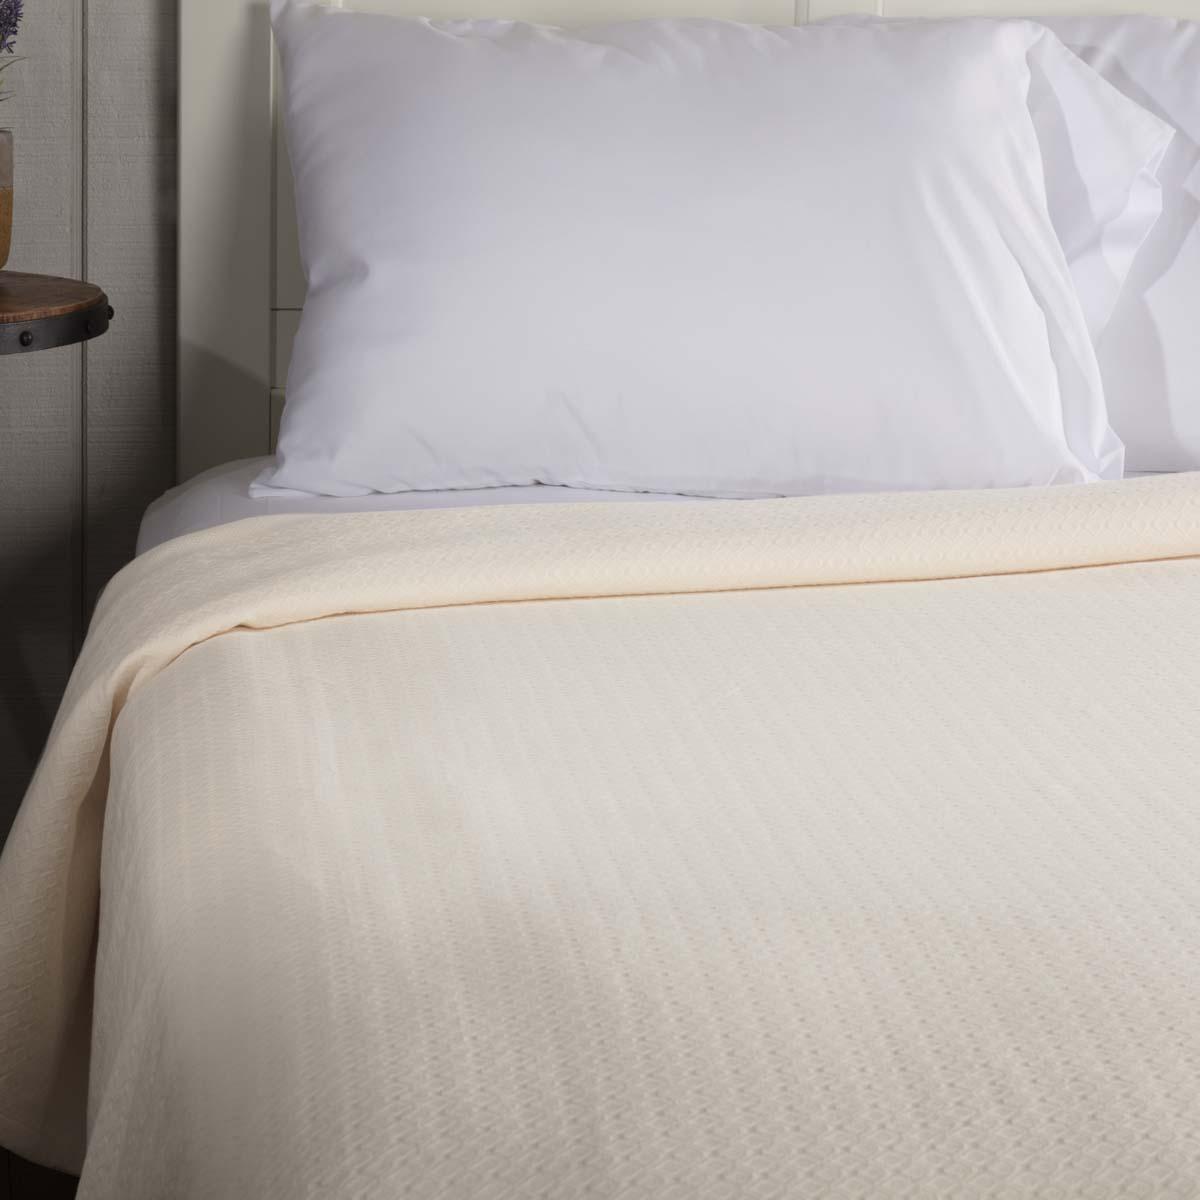 Serenity Creme Twin Cotton Woven Blanket 90x62